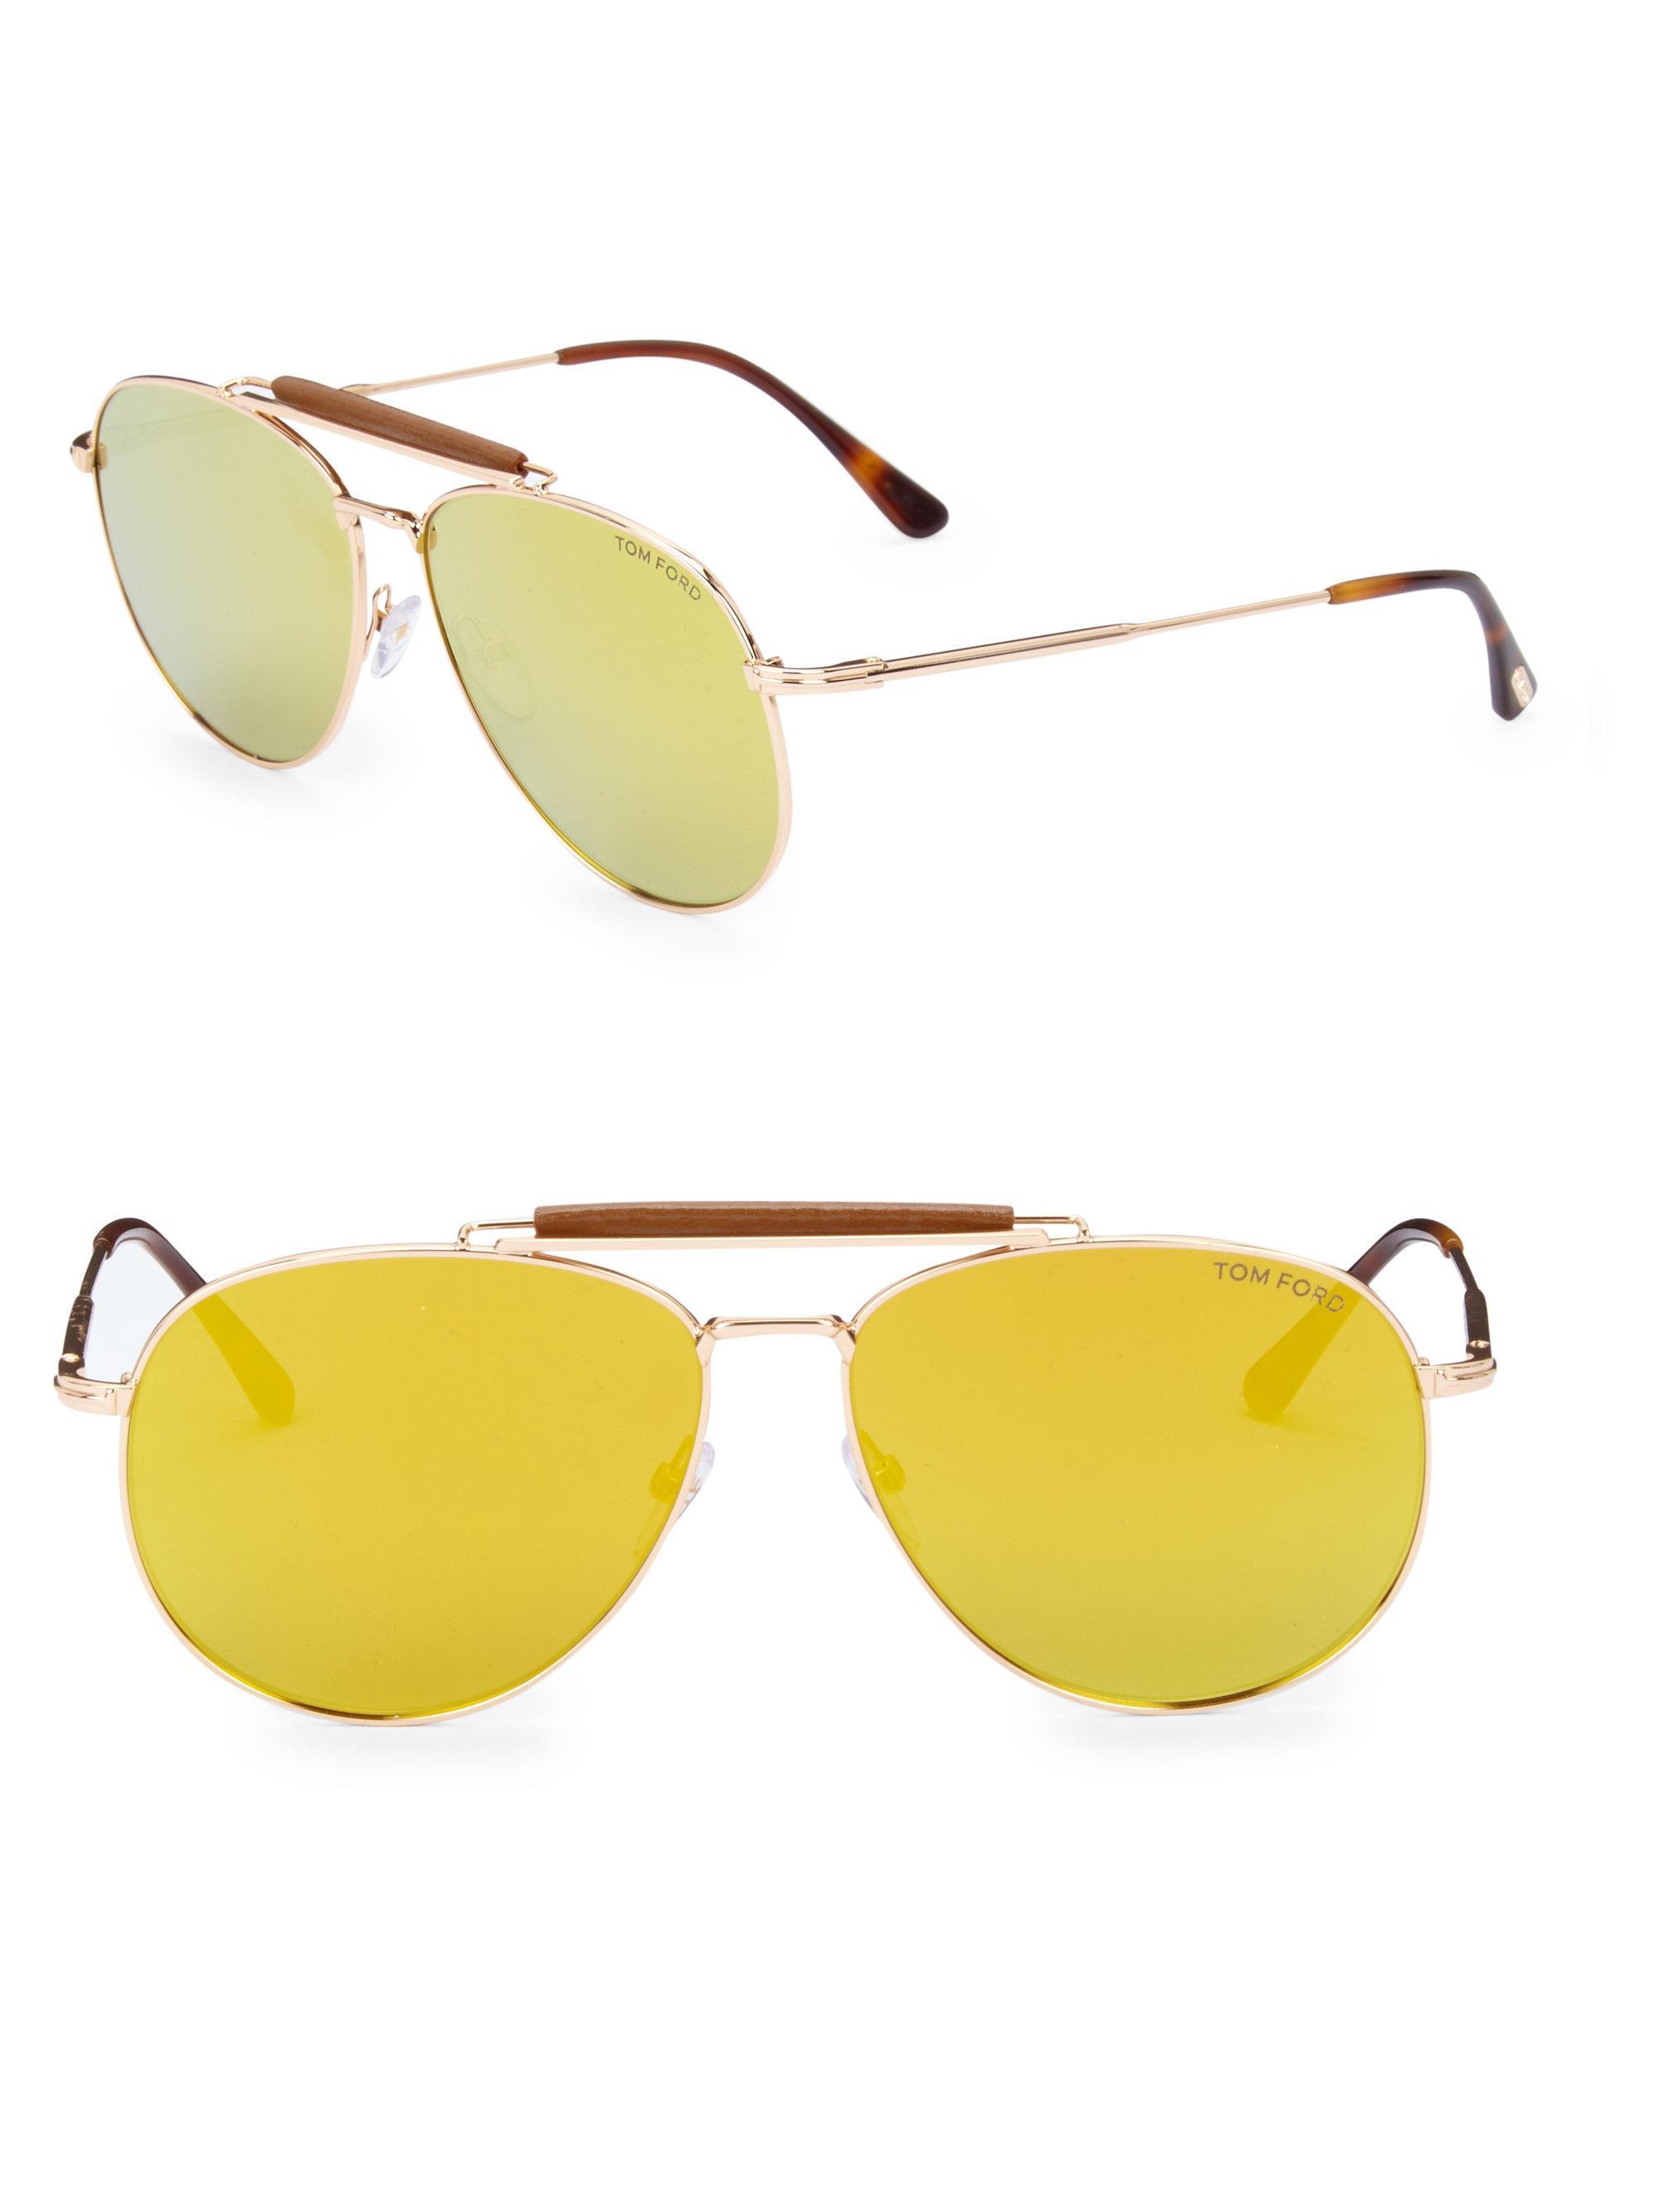 08f71371331 Tom Ford - Metallic Sean 60mm Mirrored Aviator Sunglasses for Men - Lyst.  View fullscreen